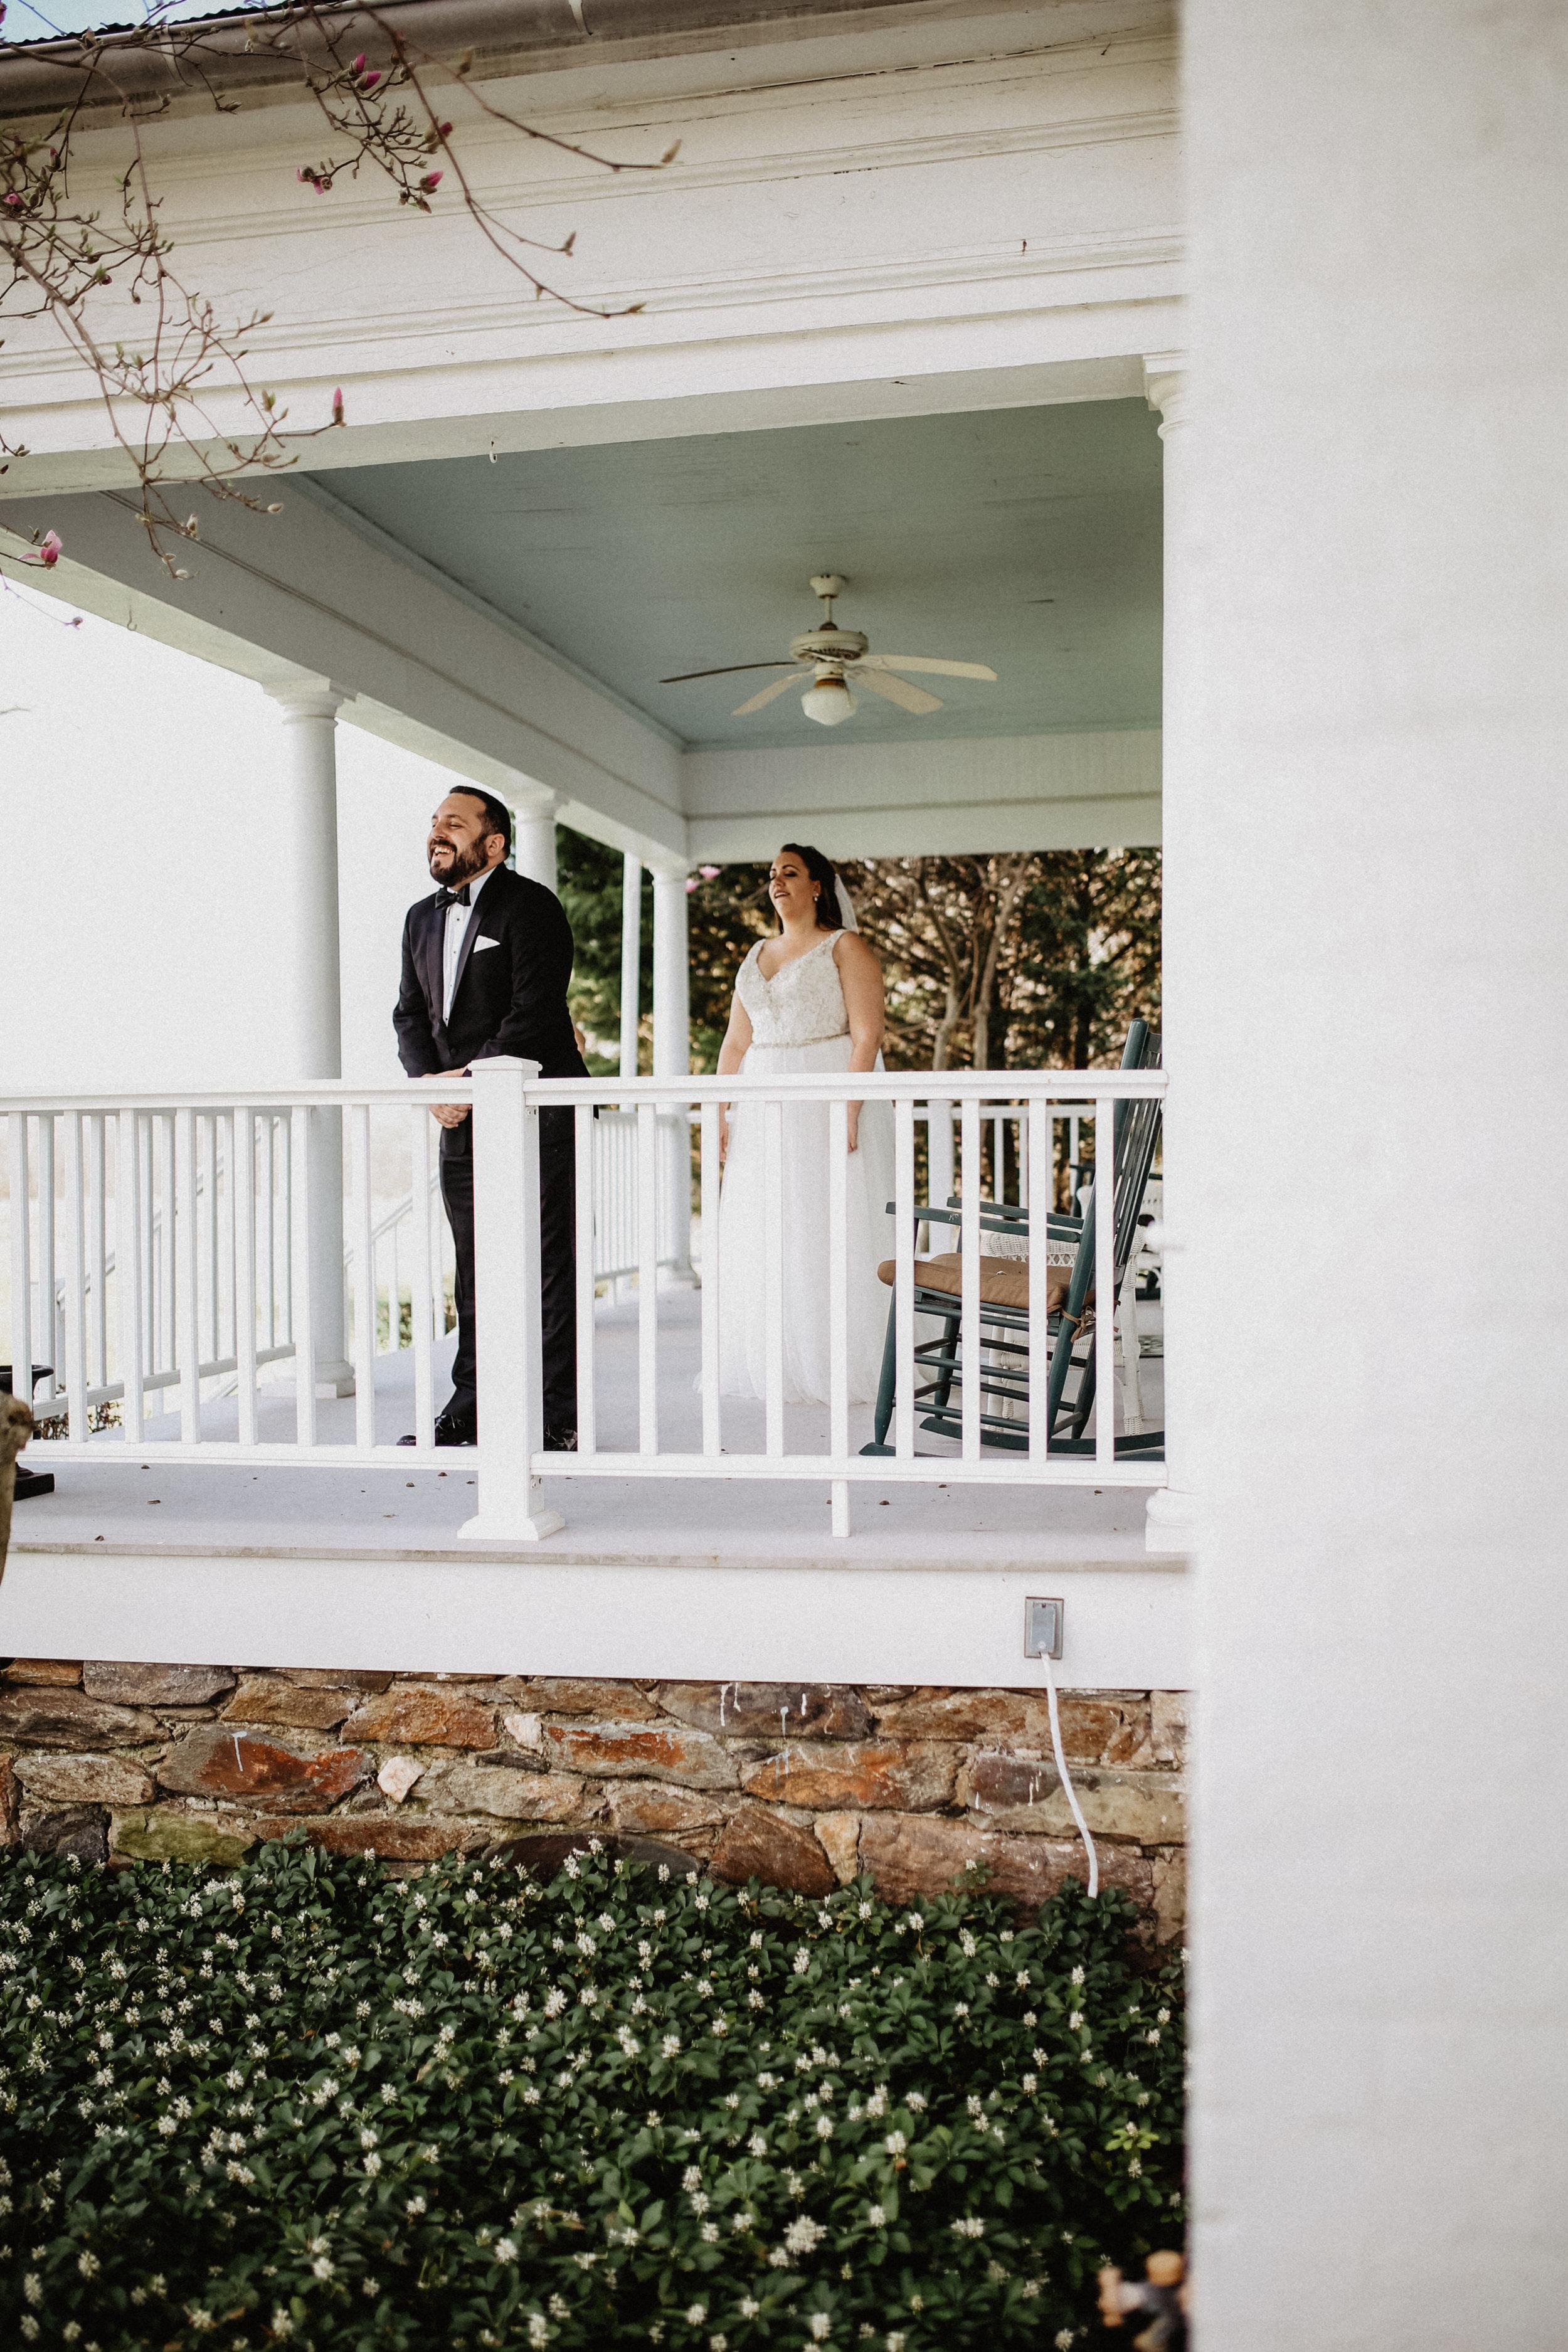 AnthonyKyndra_Married_2018-50.jpg